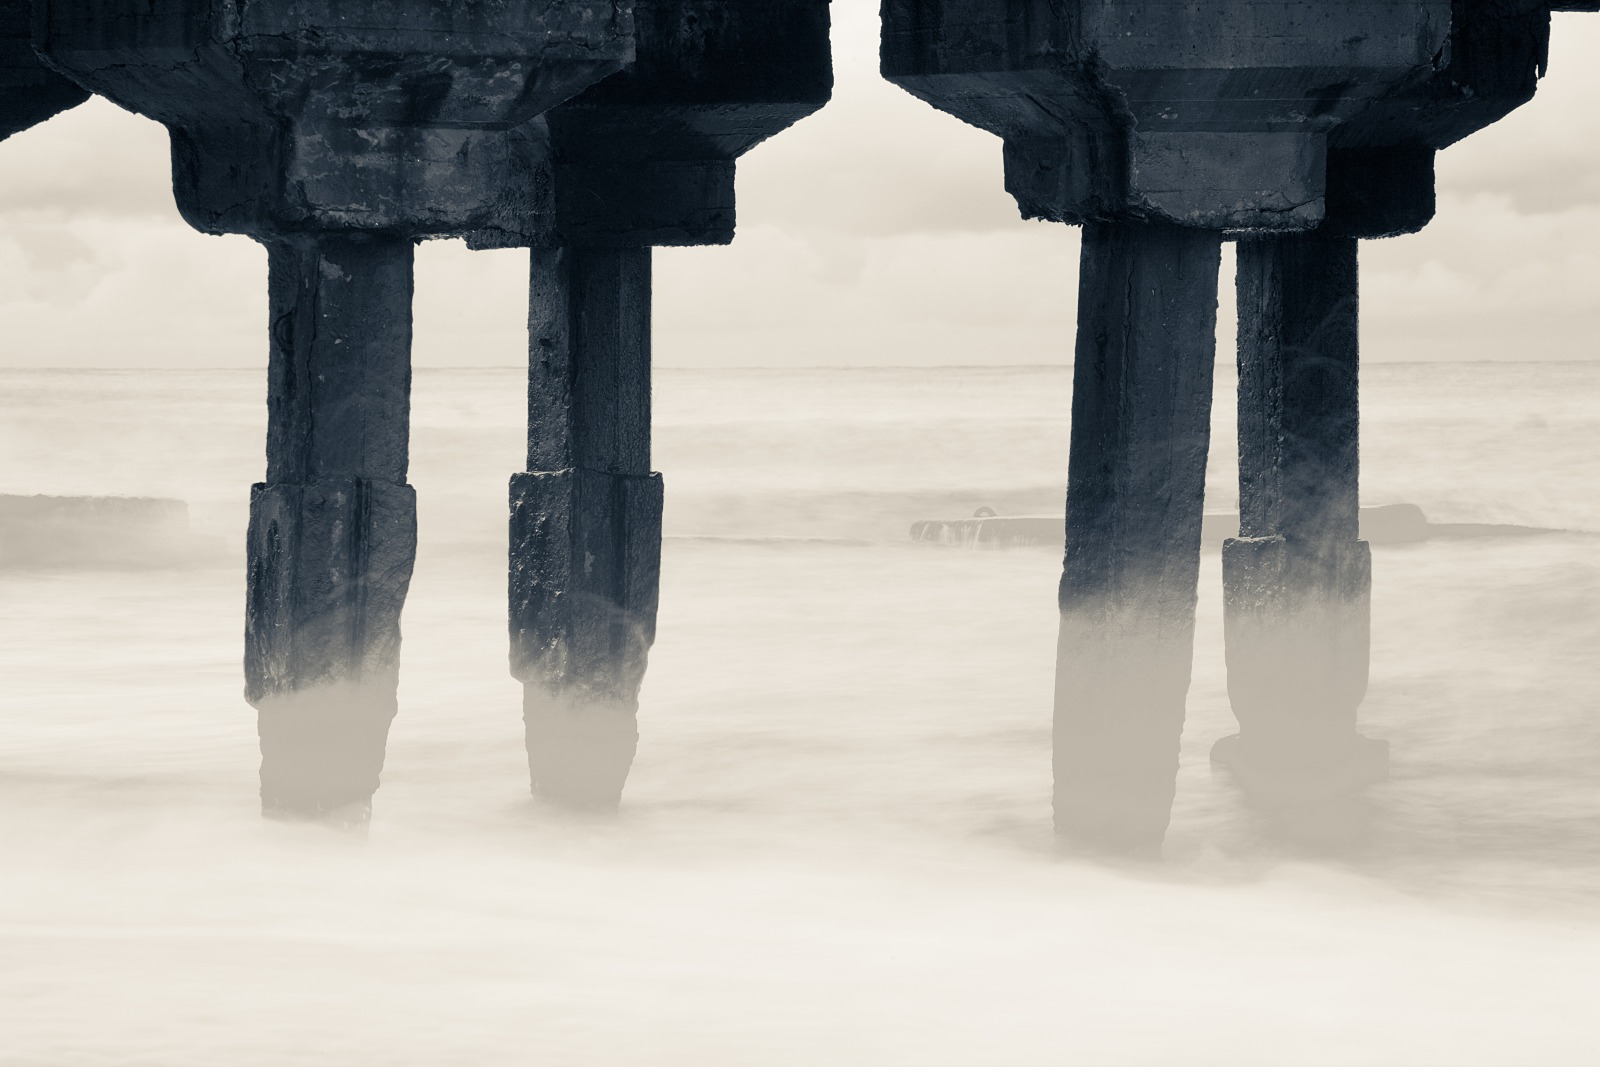 Concrete construction in the sea in twilight